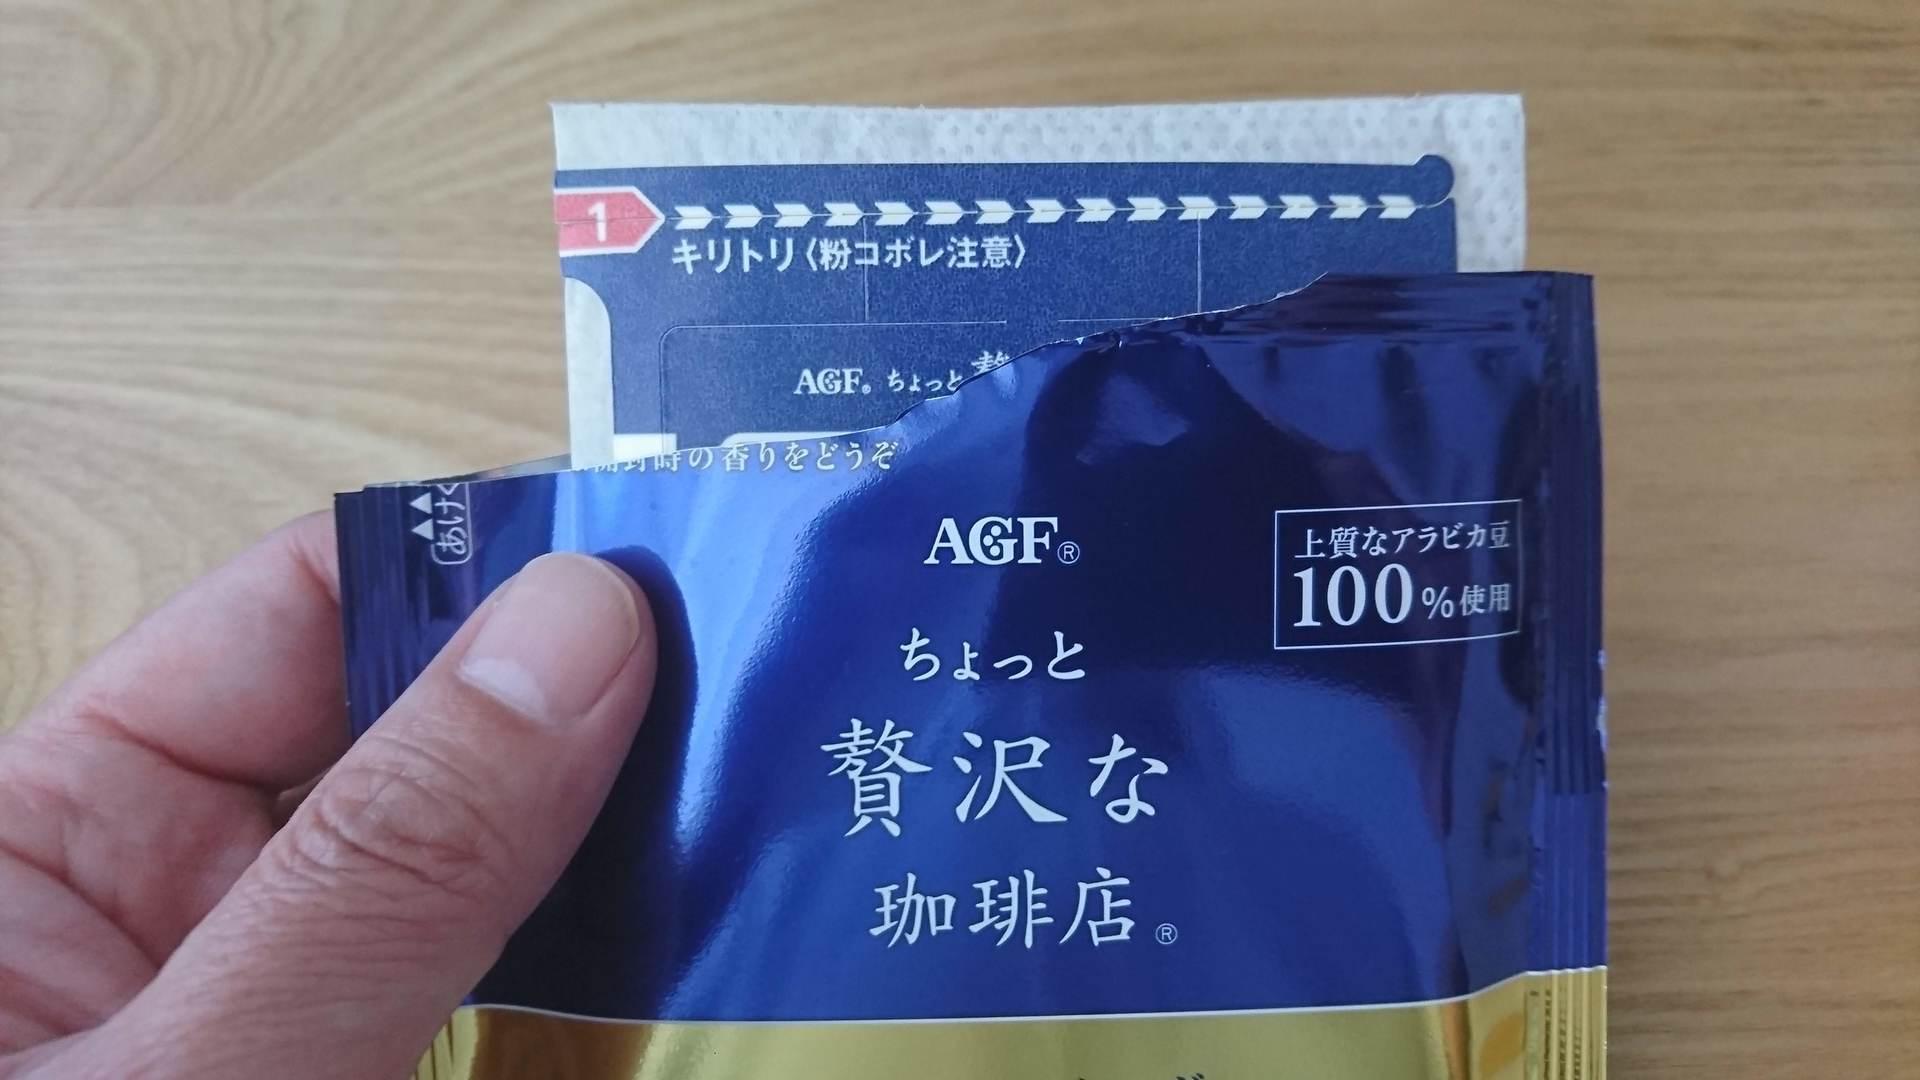 DSC_6686.JPG